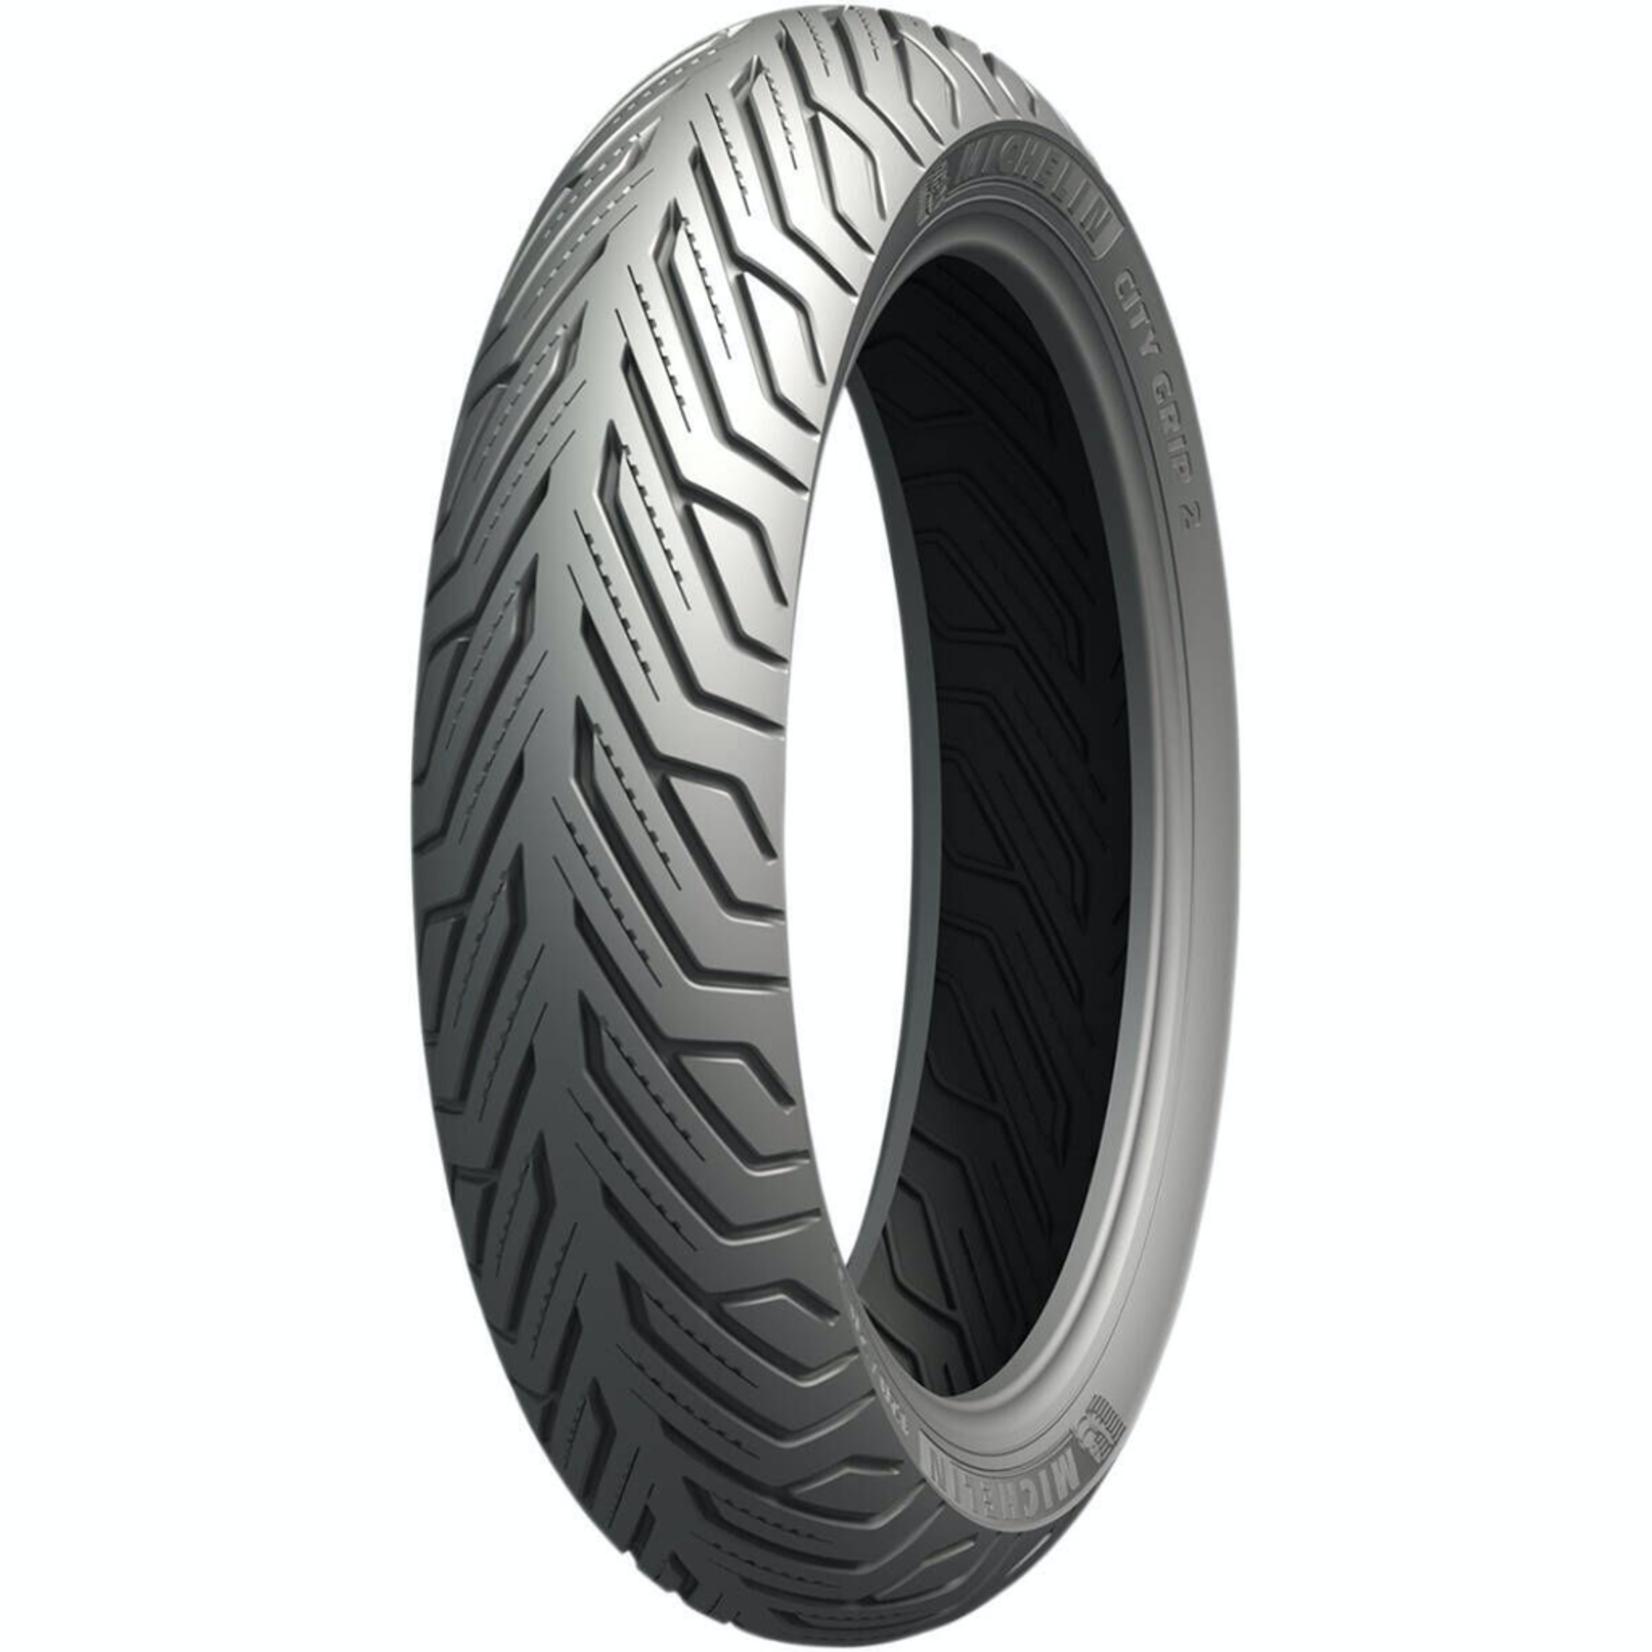 "Parts Tire, 90/80-16"" Michelin City Grip2"